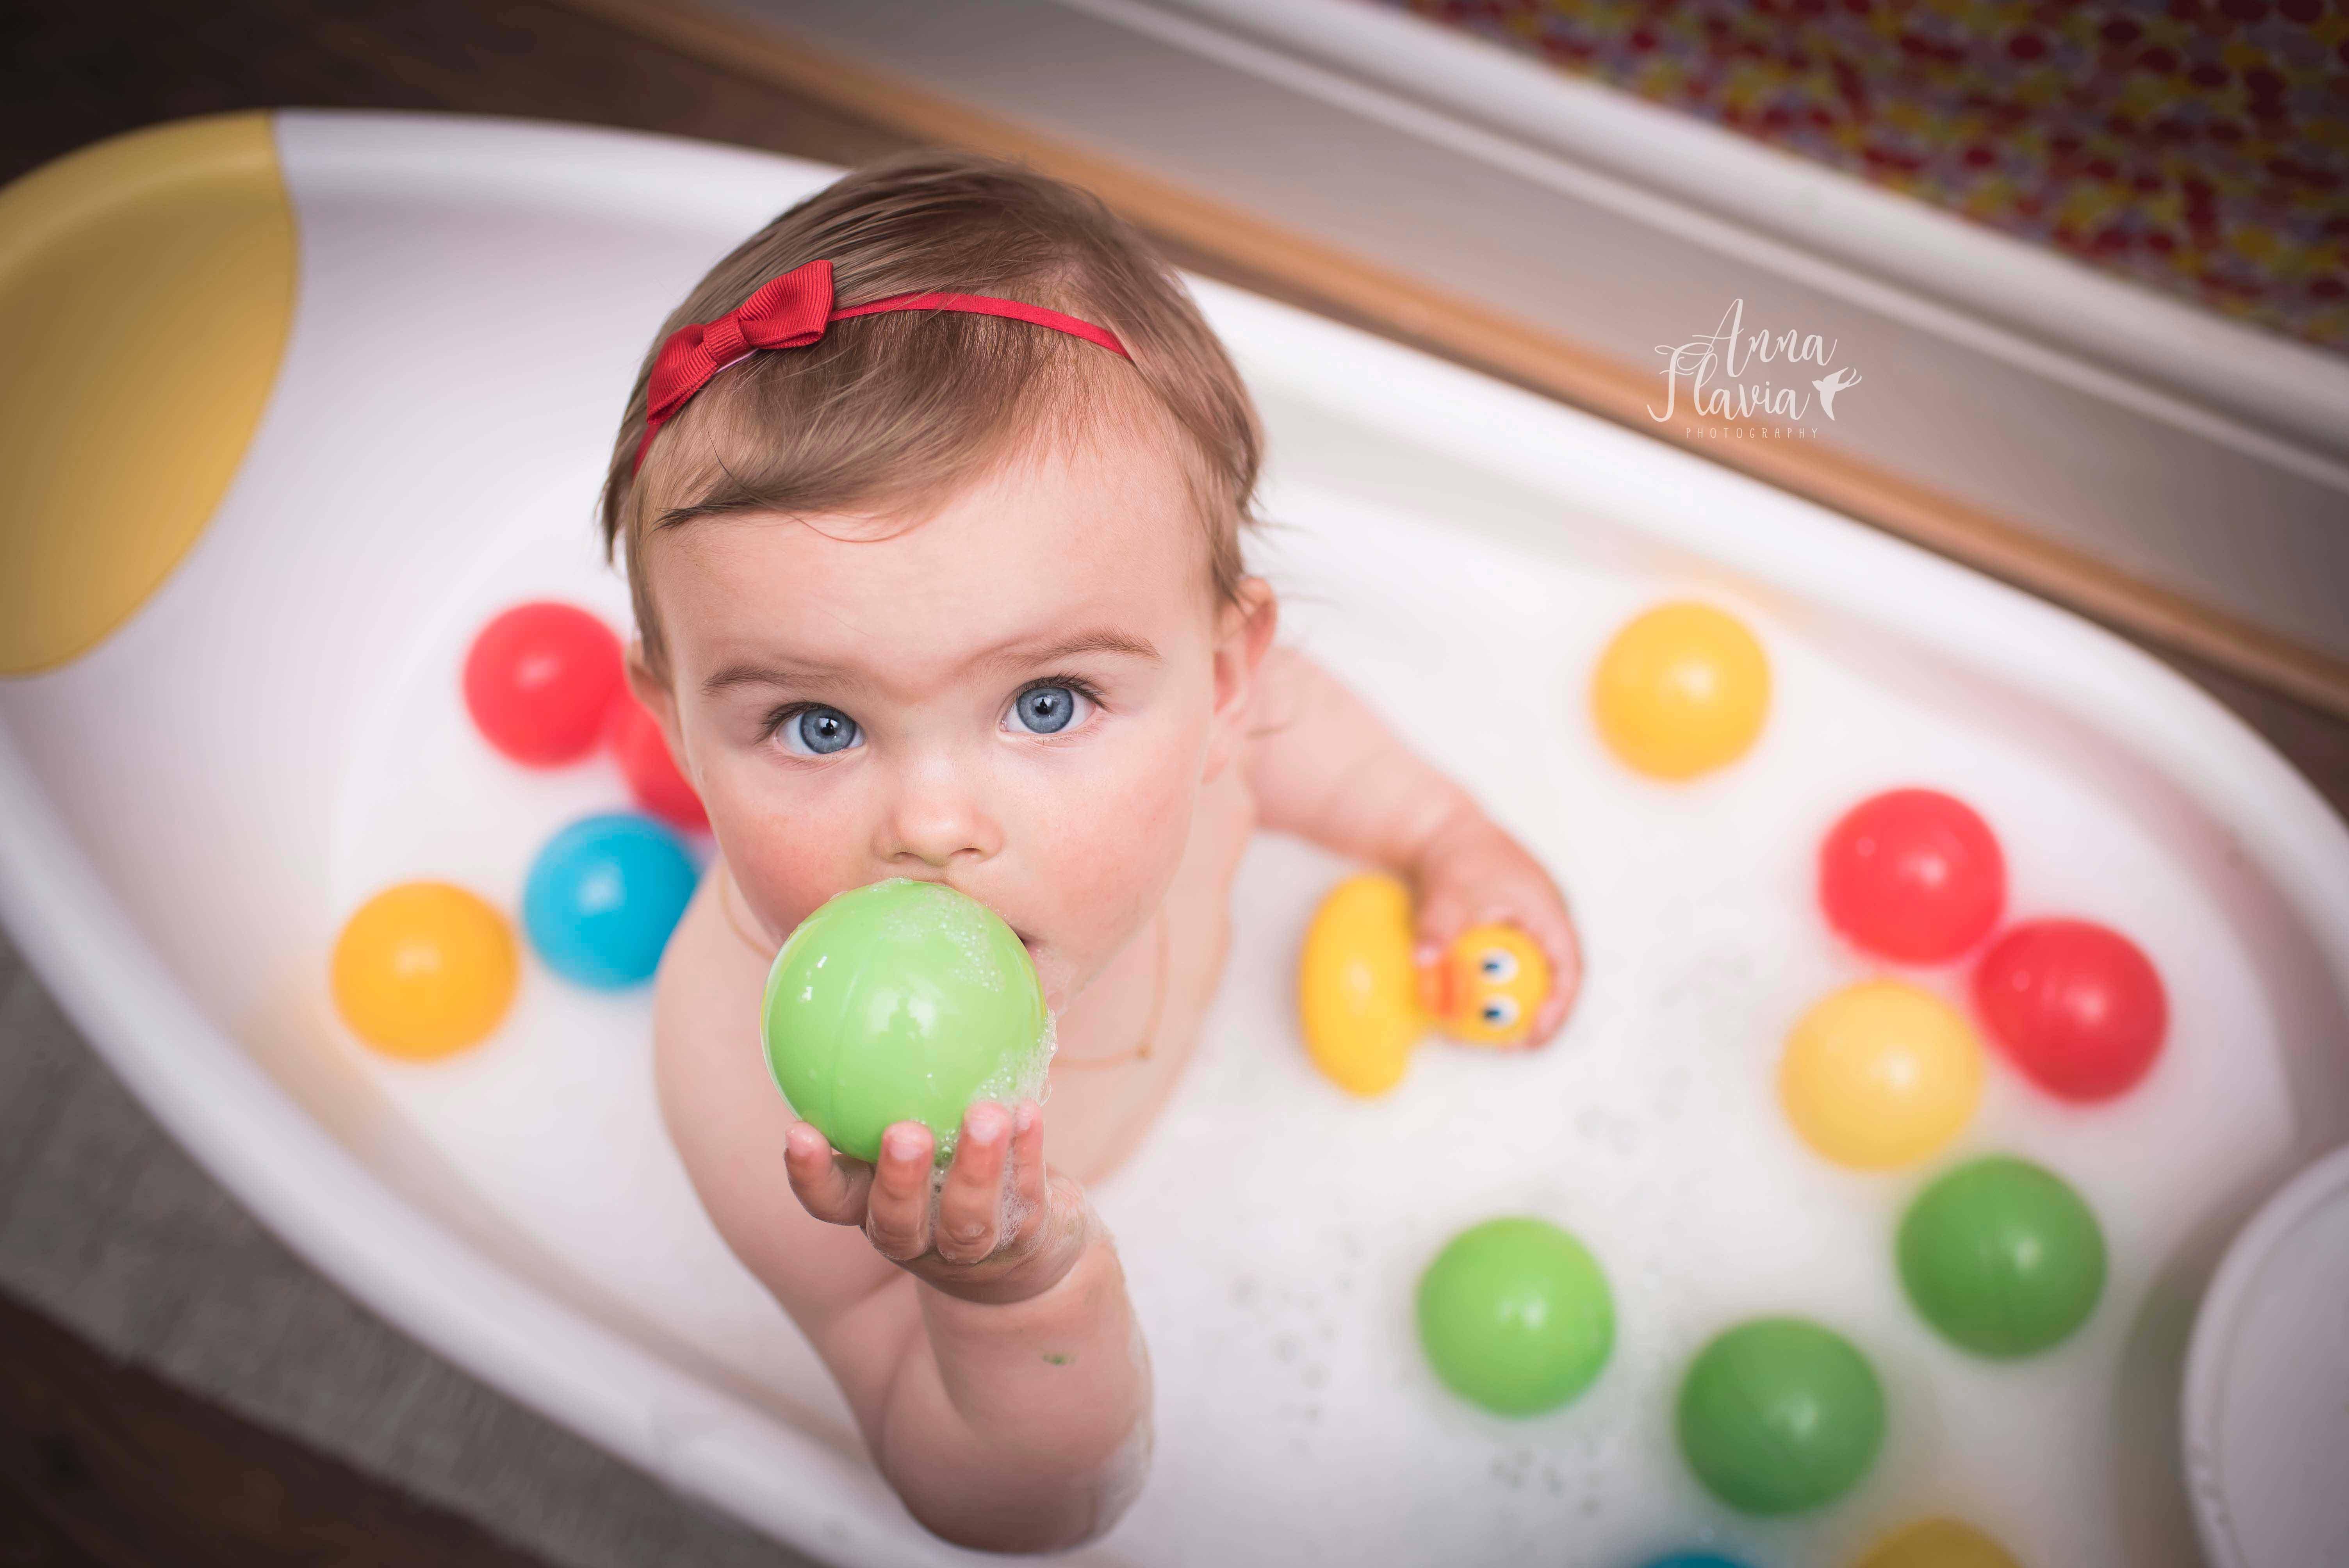 photographer_dublin_anna_flavia_children_baby_newborn_family_31